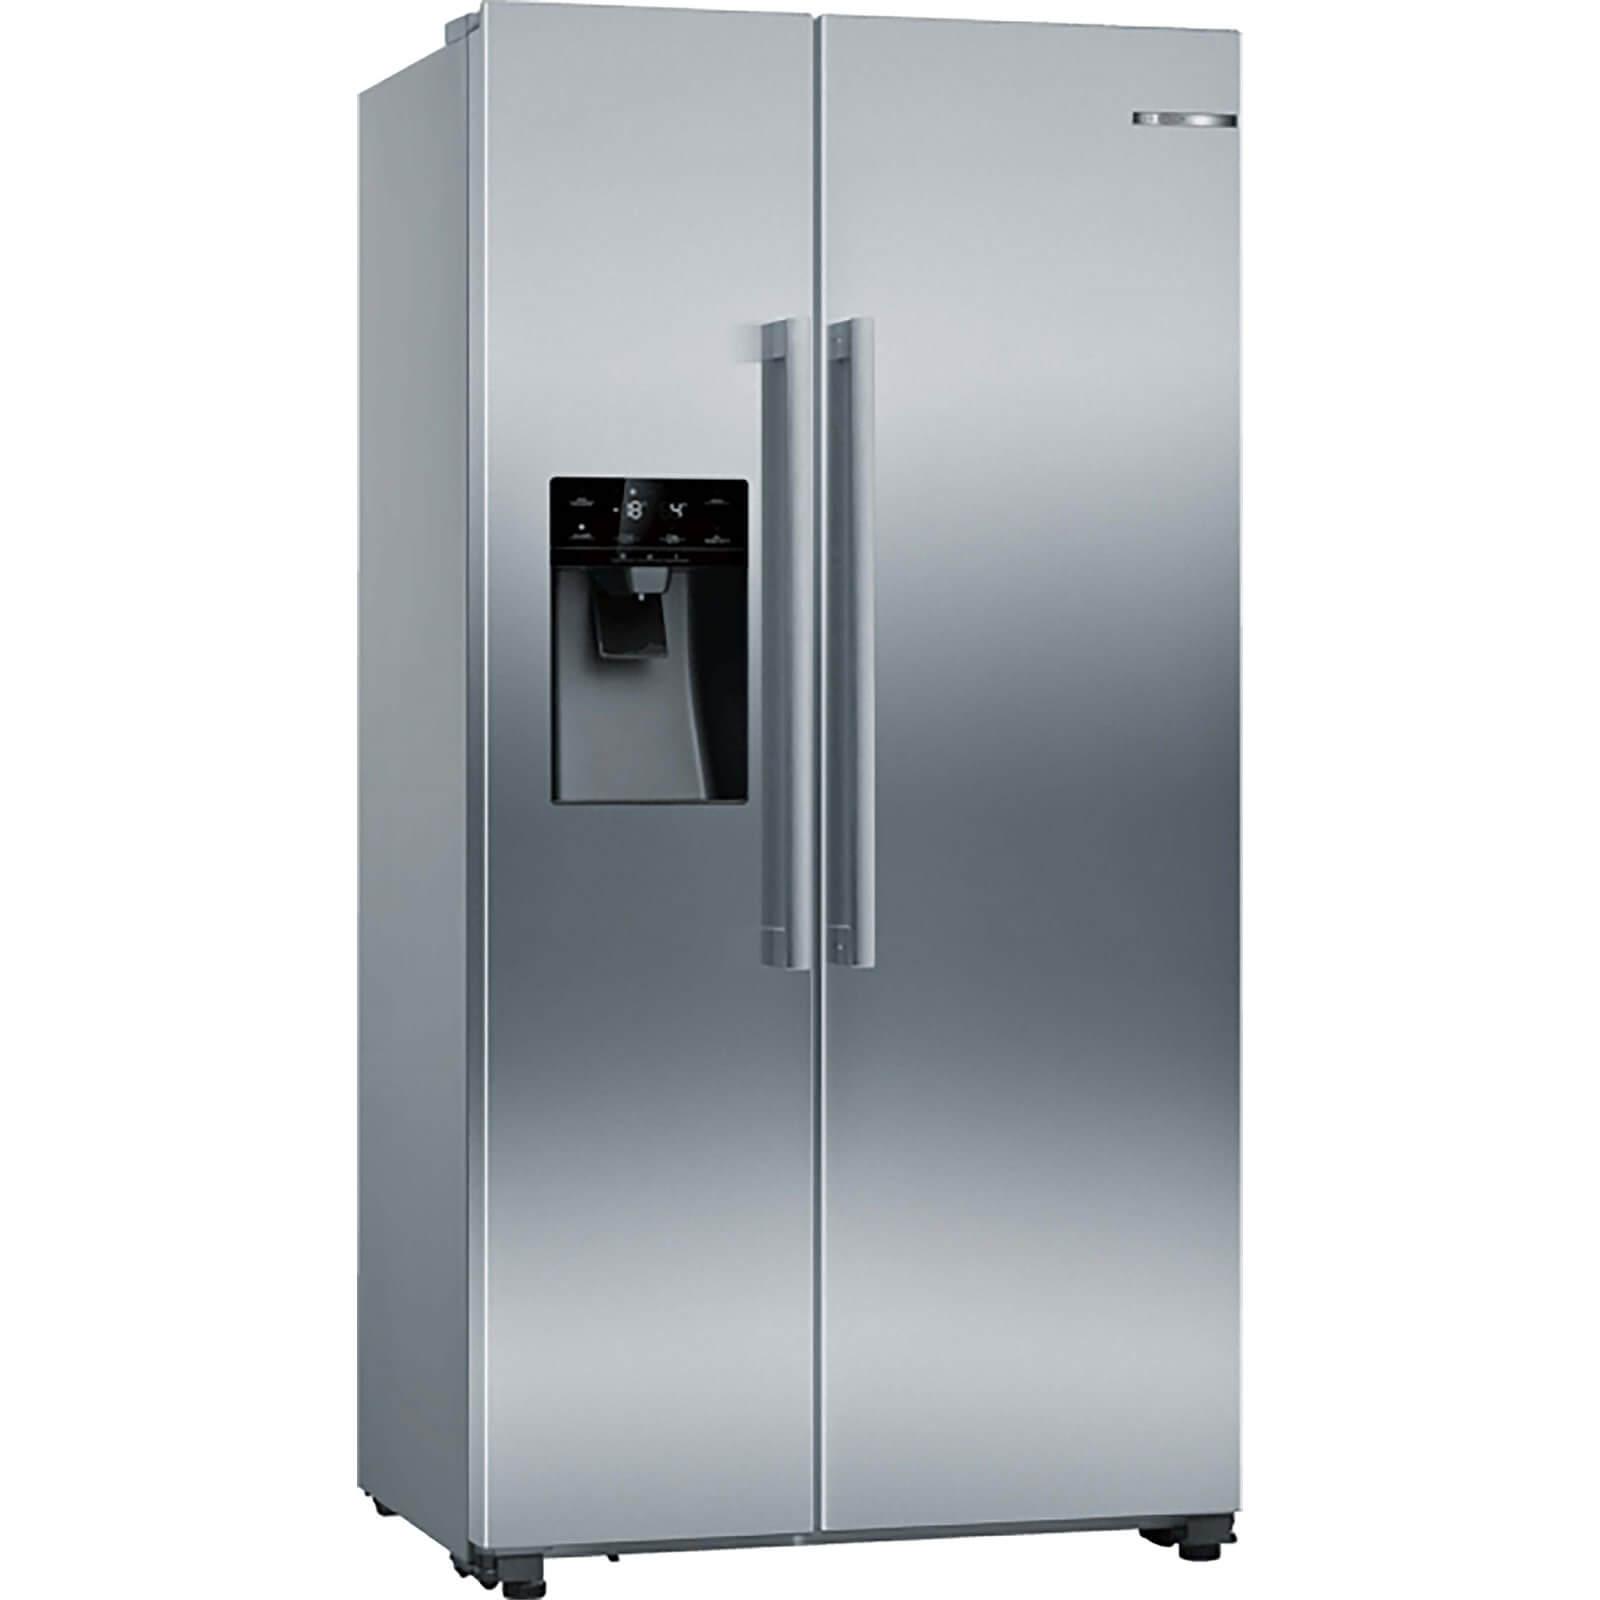 Bosch KAI93VIFPG Series 6 Side By Side American Fridge Freezer